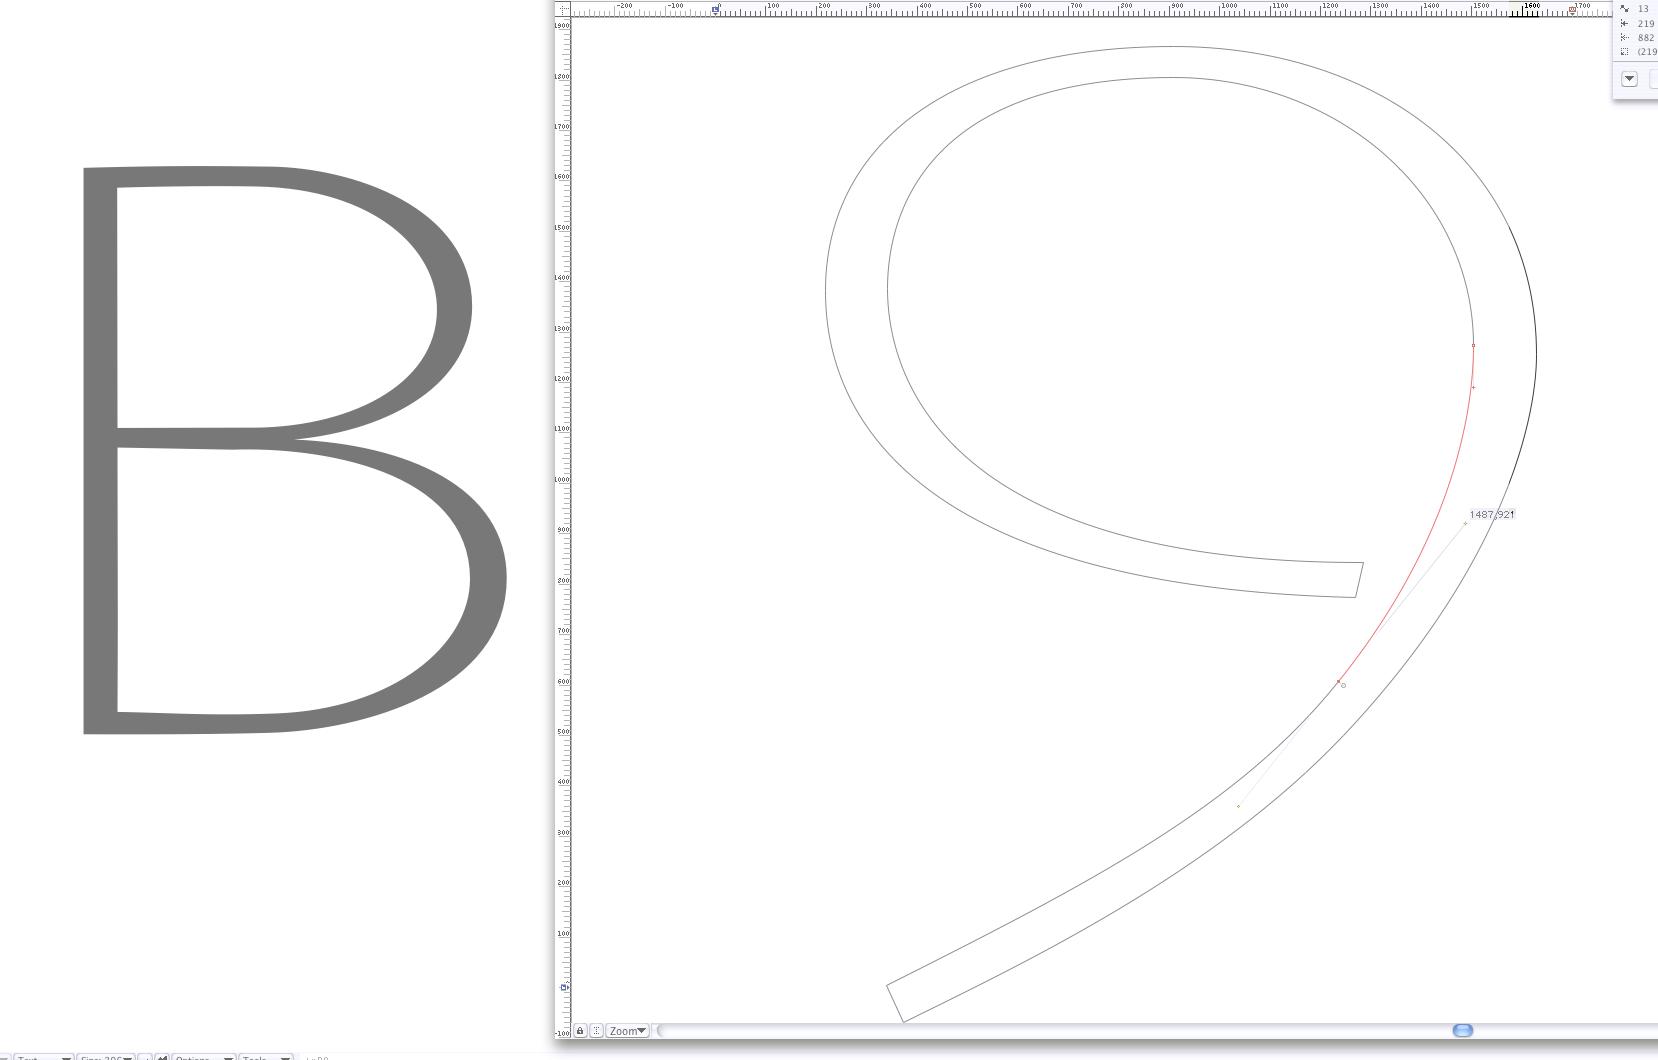 'B9' · Working on '9'